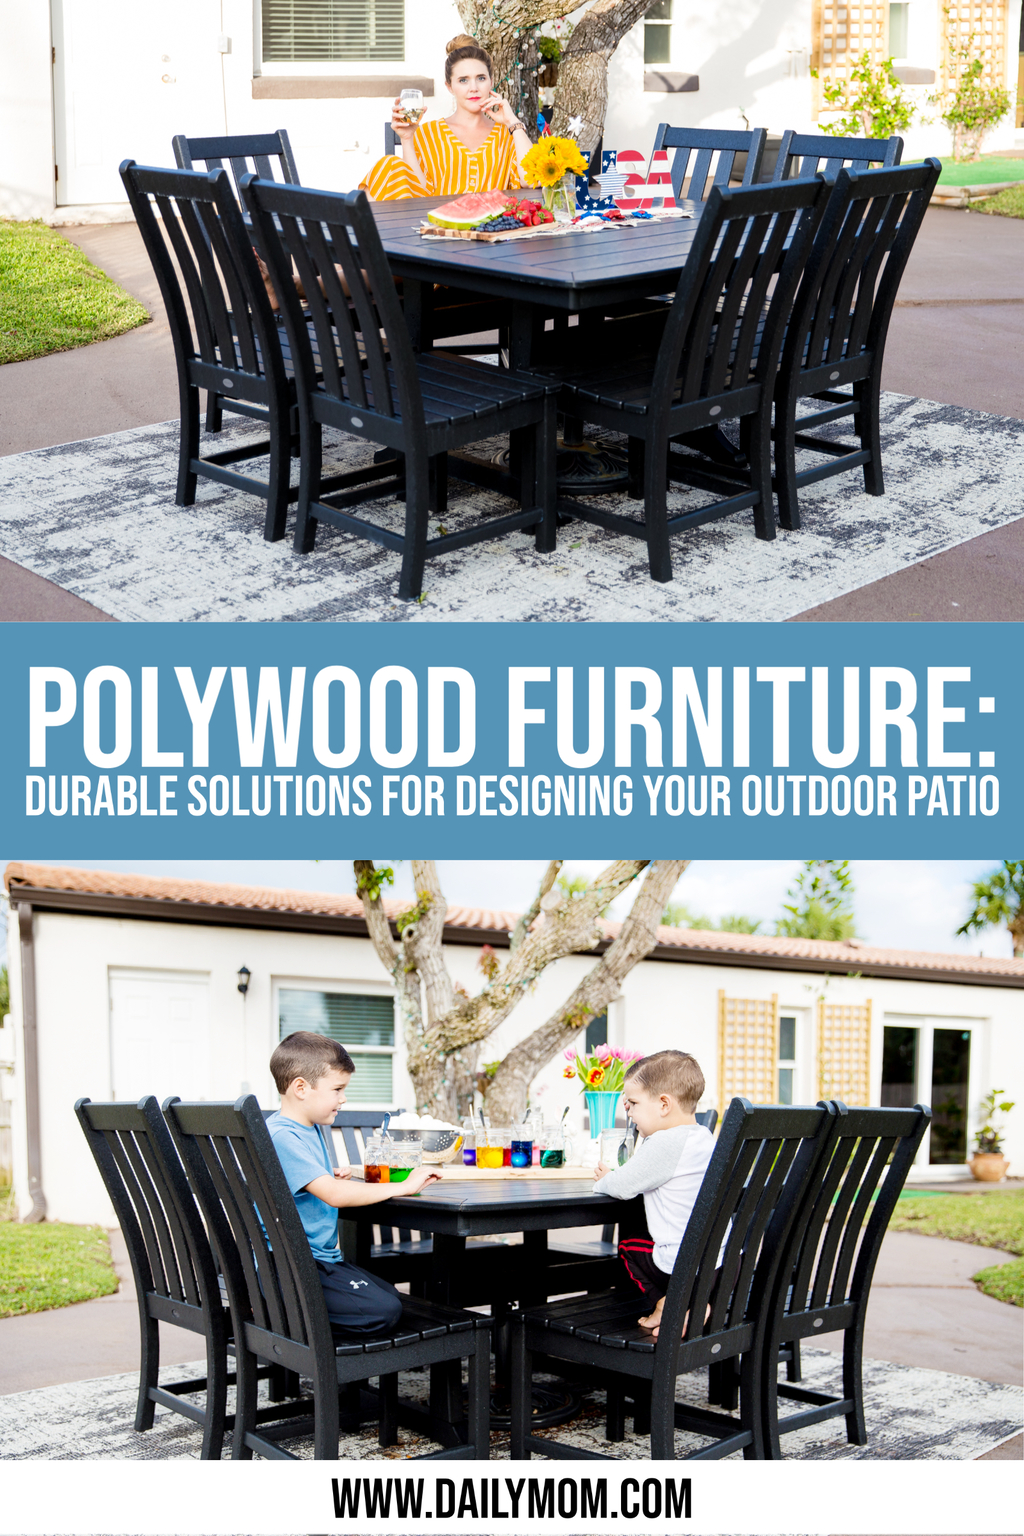 Polywood watch 2